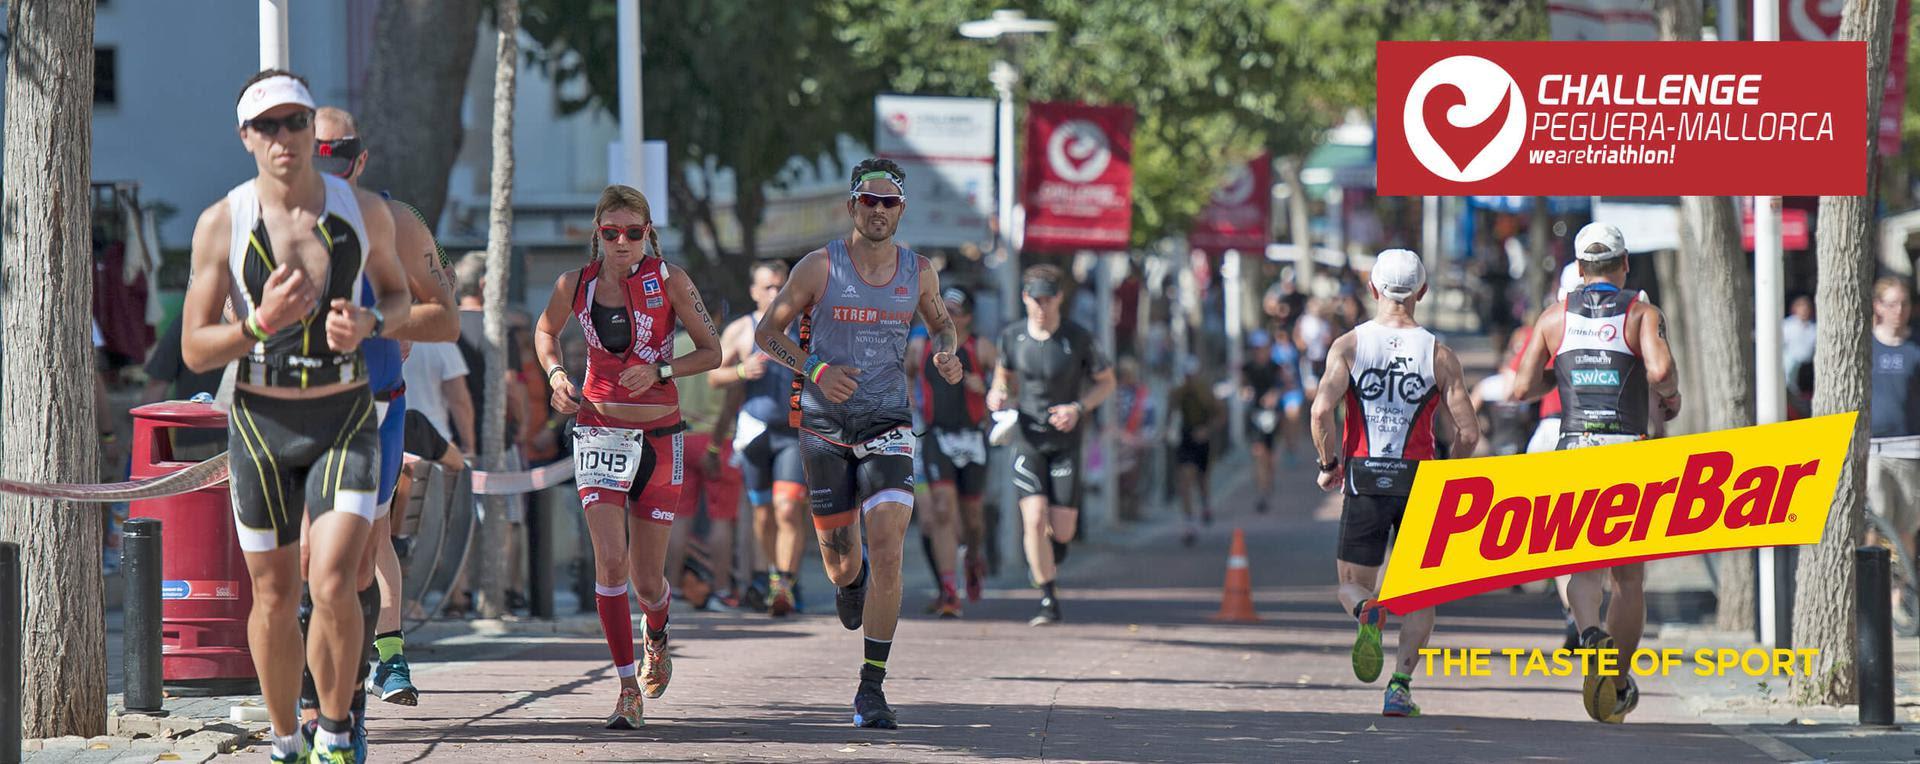 Triathlon Majorca Aid stations - Challenge Mallorca triathlon